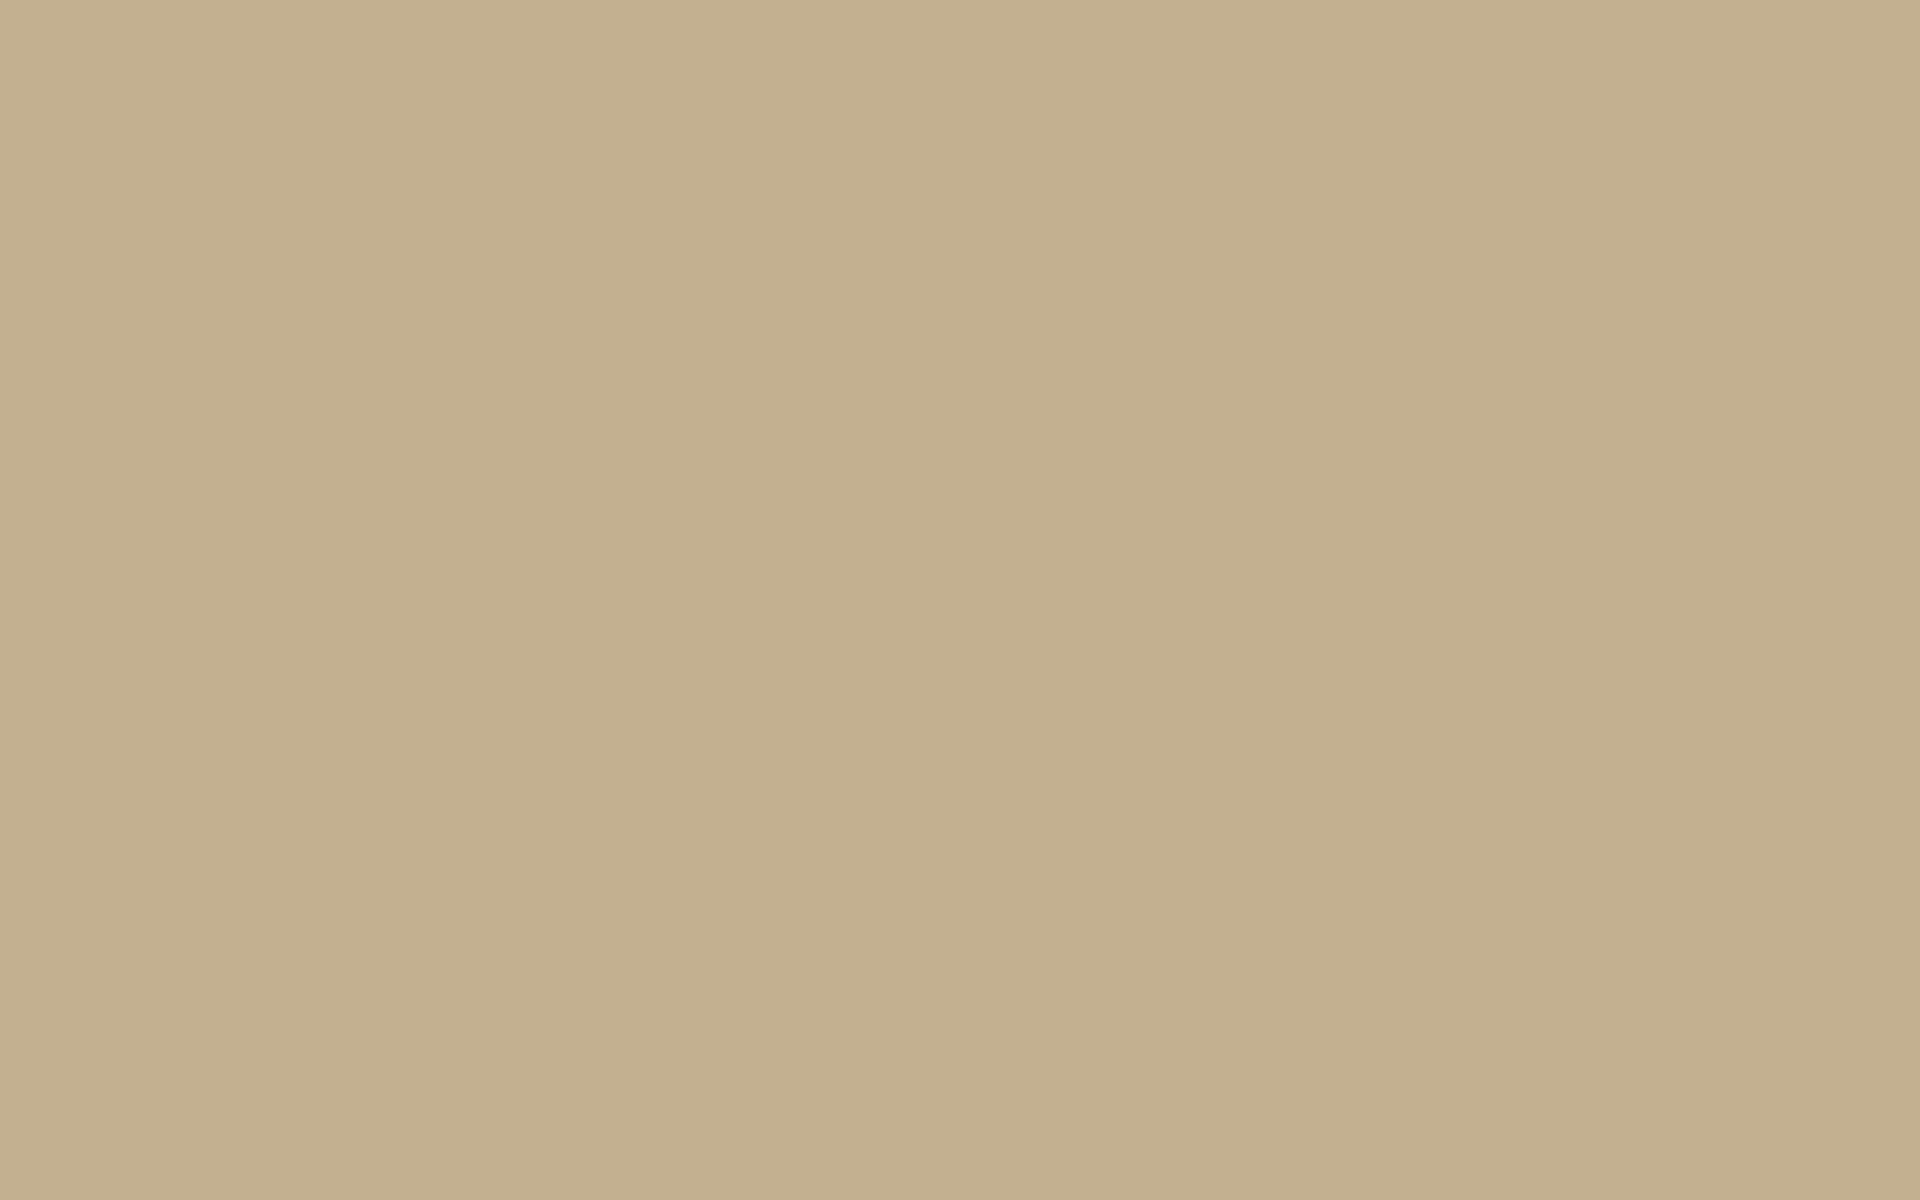 1920x1200 Khaki Web Solid Color Background